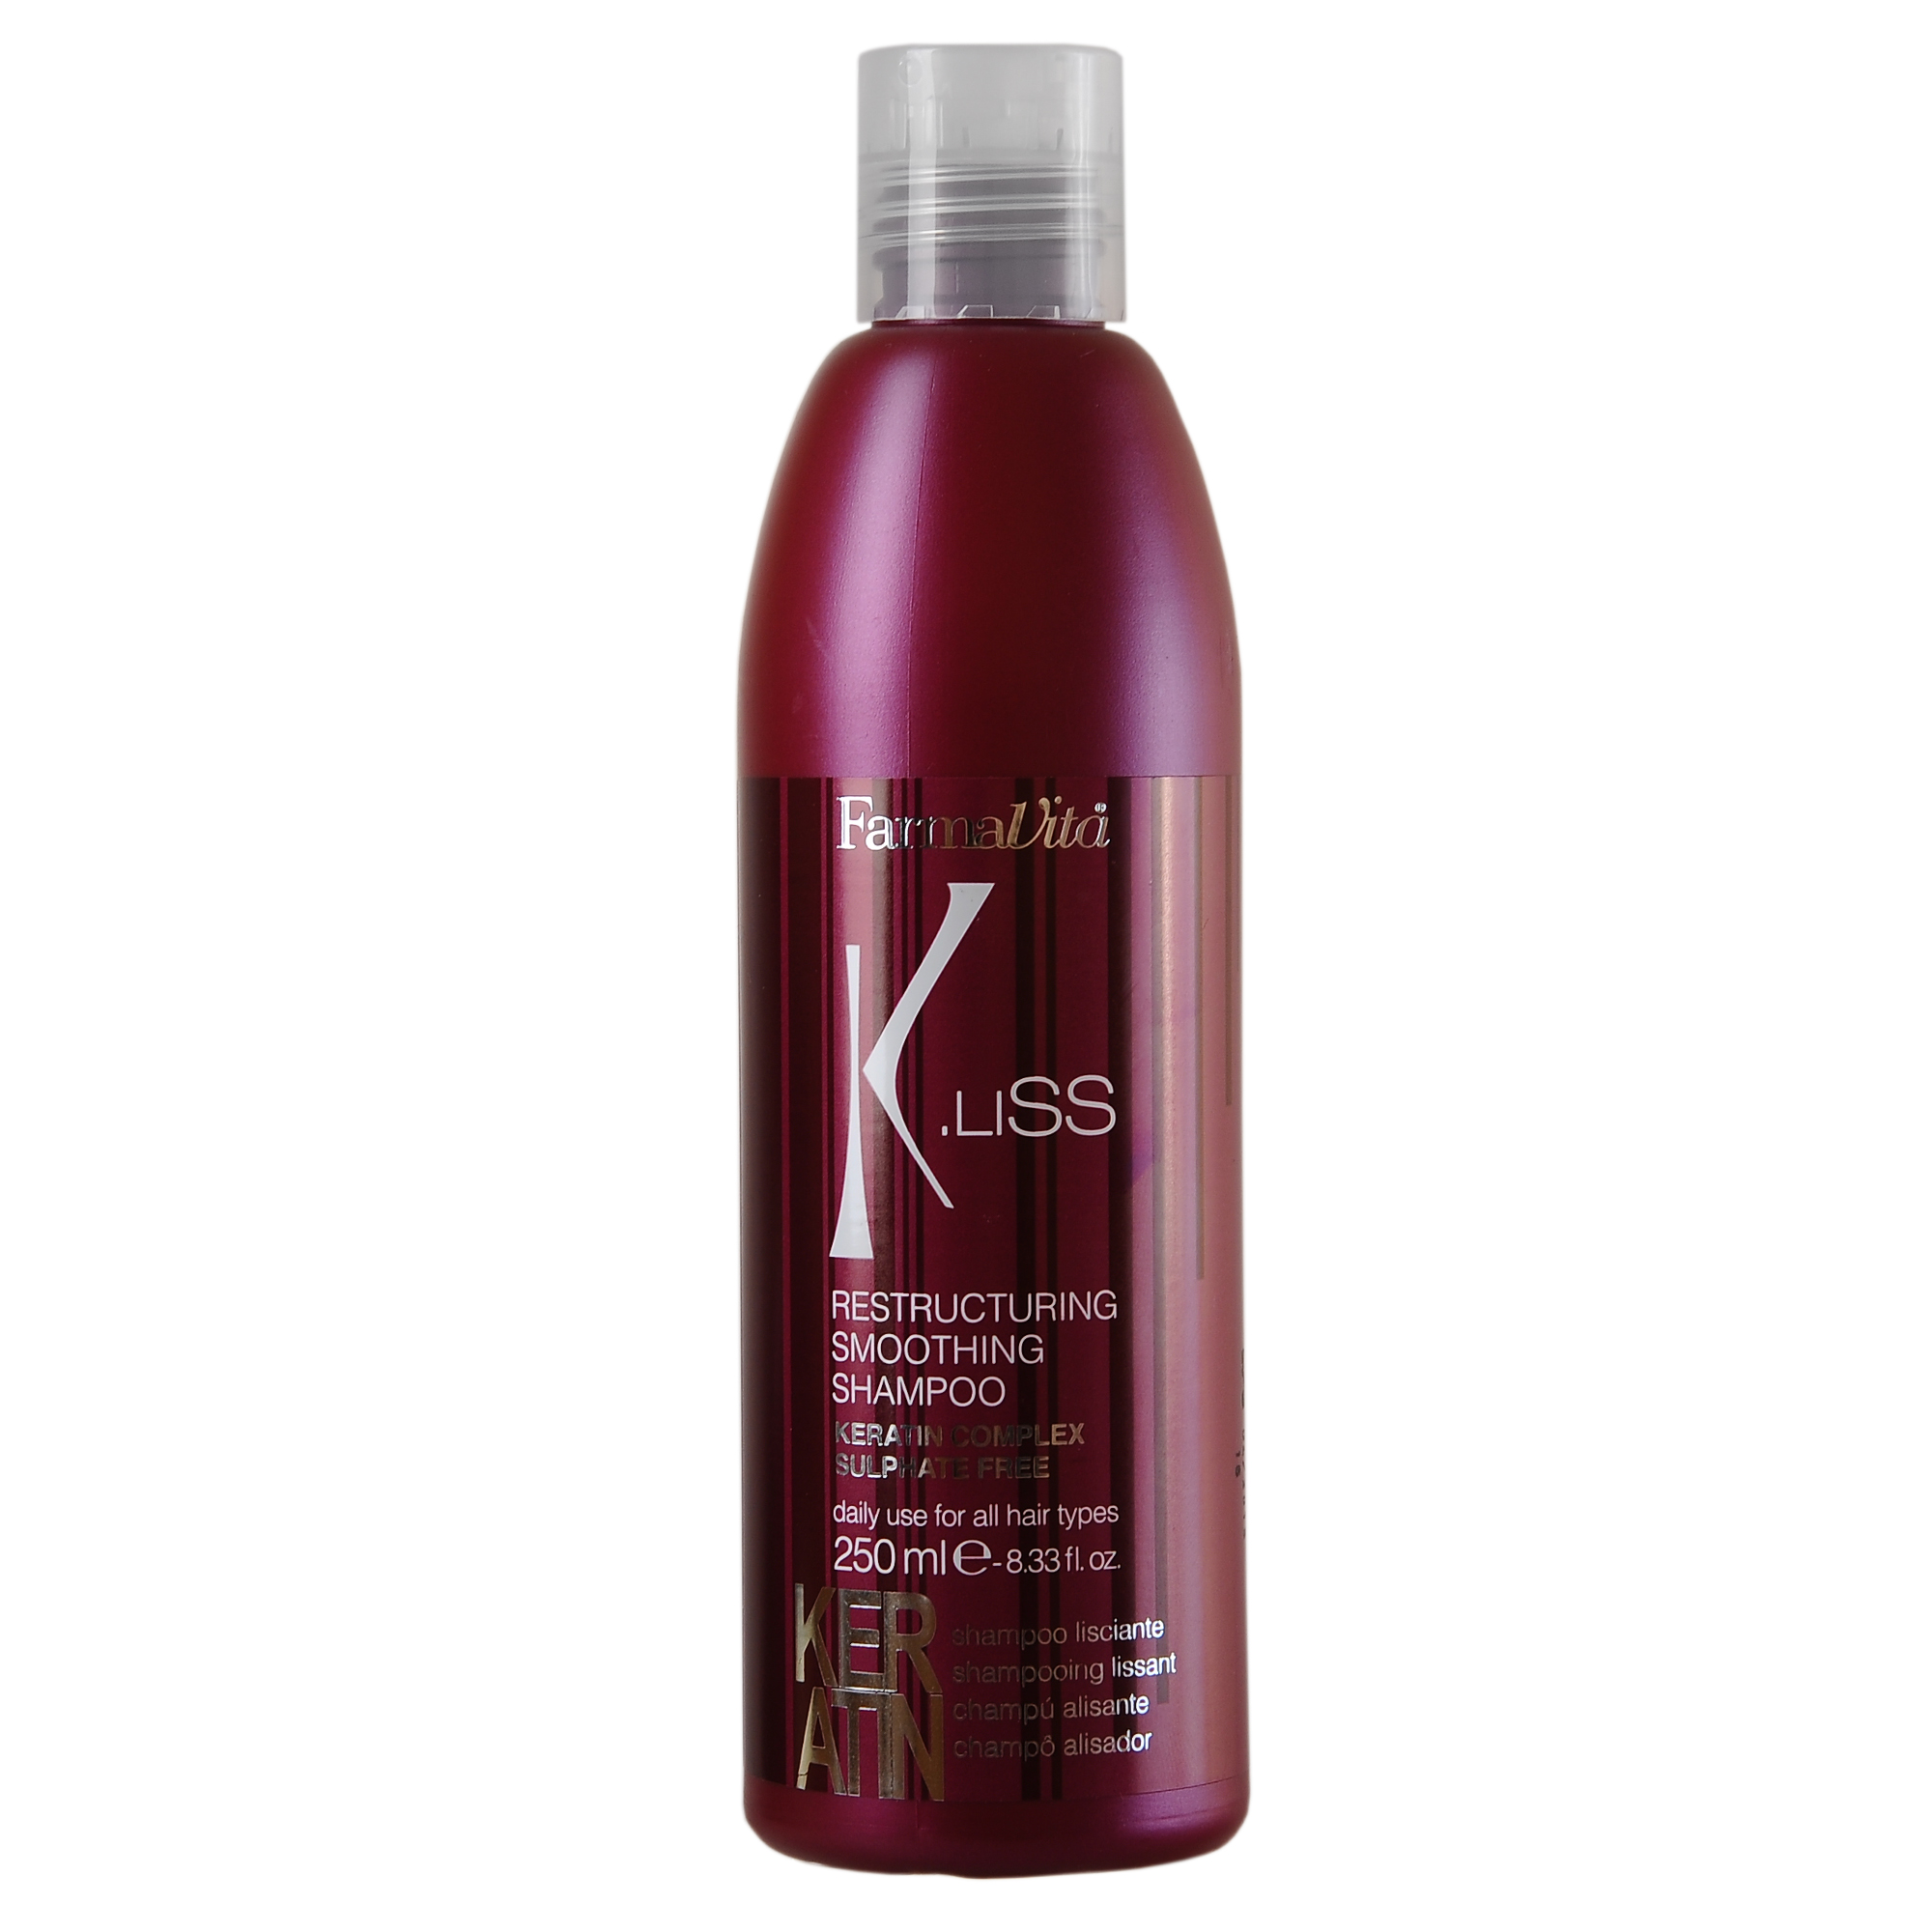 FARMAVITA ������� ��������. � ��������� K.Liss Restructuring smoothing shampoo / K.LISS 250 ��